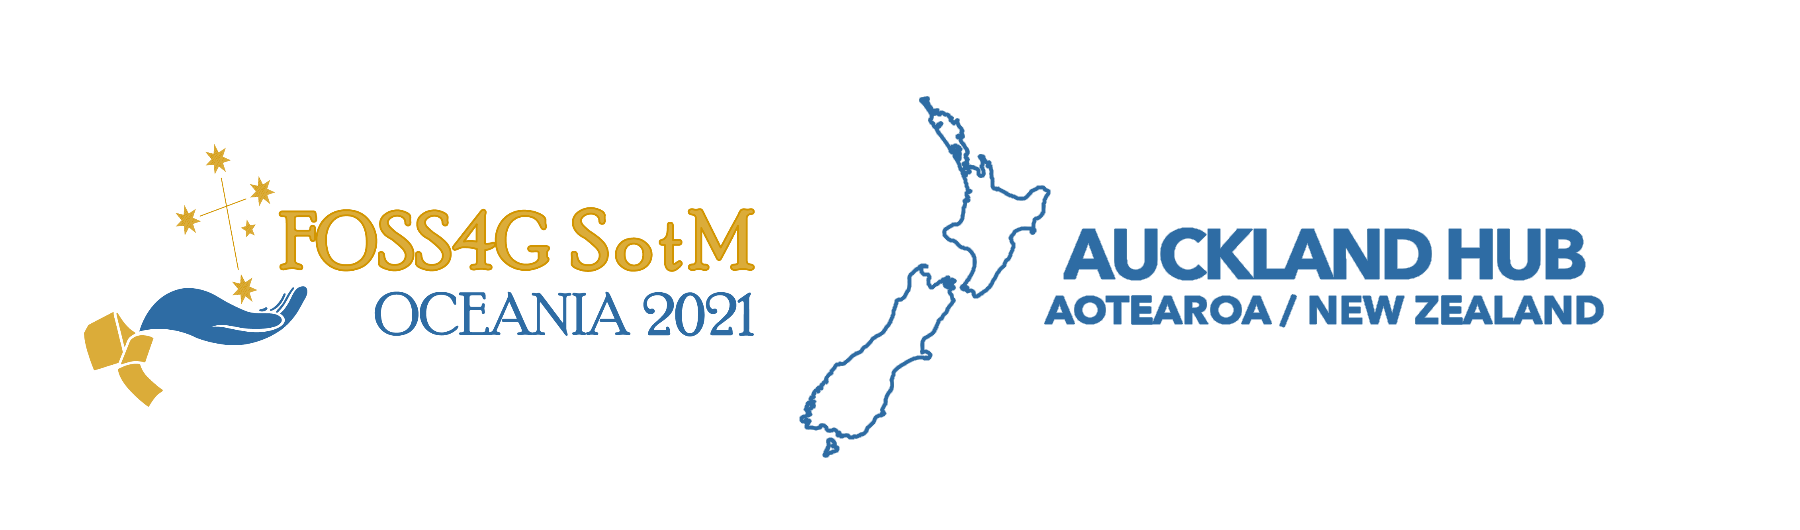 FOSS4G SotM Oceania 2021 - Auckland Hub